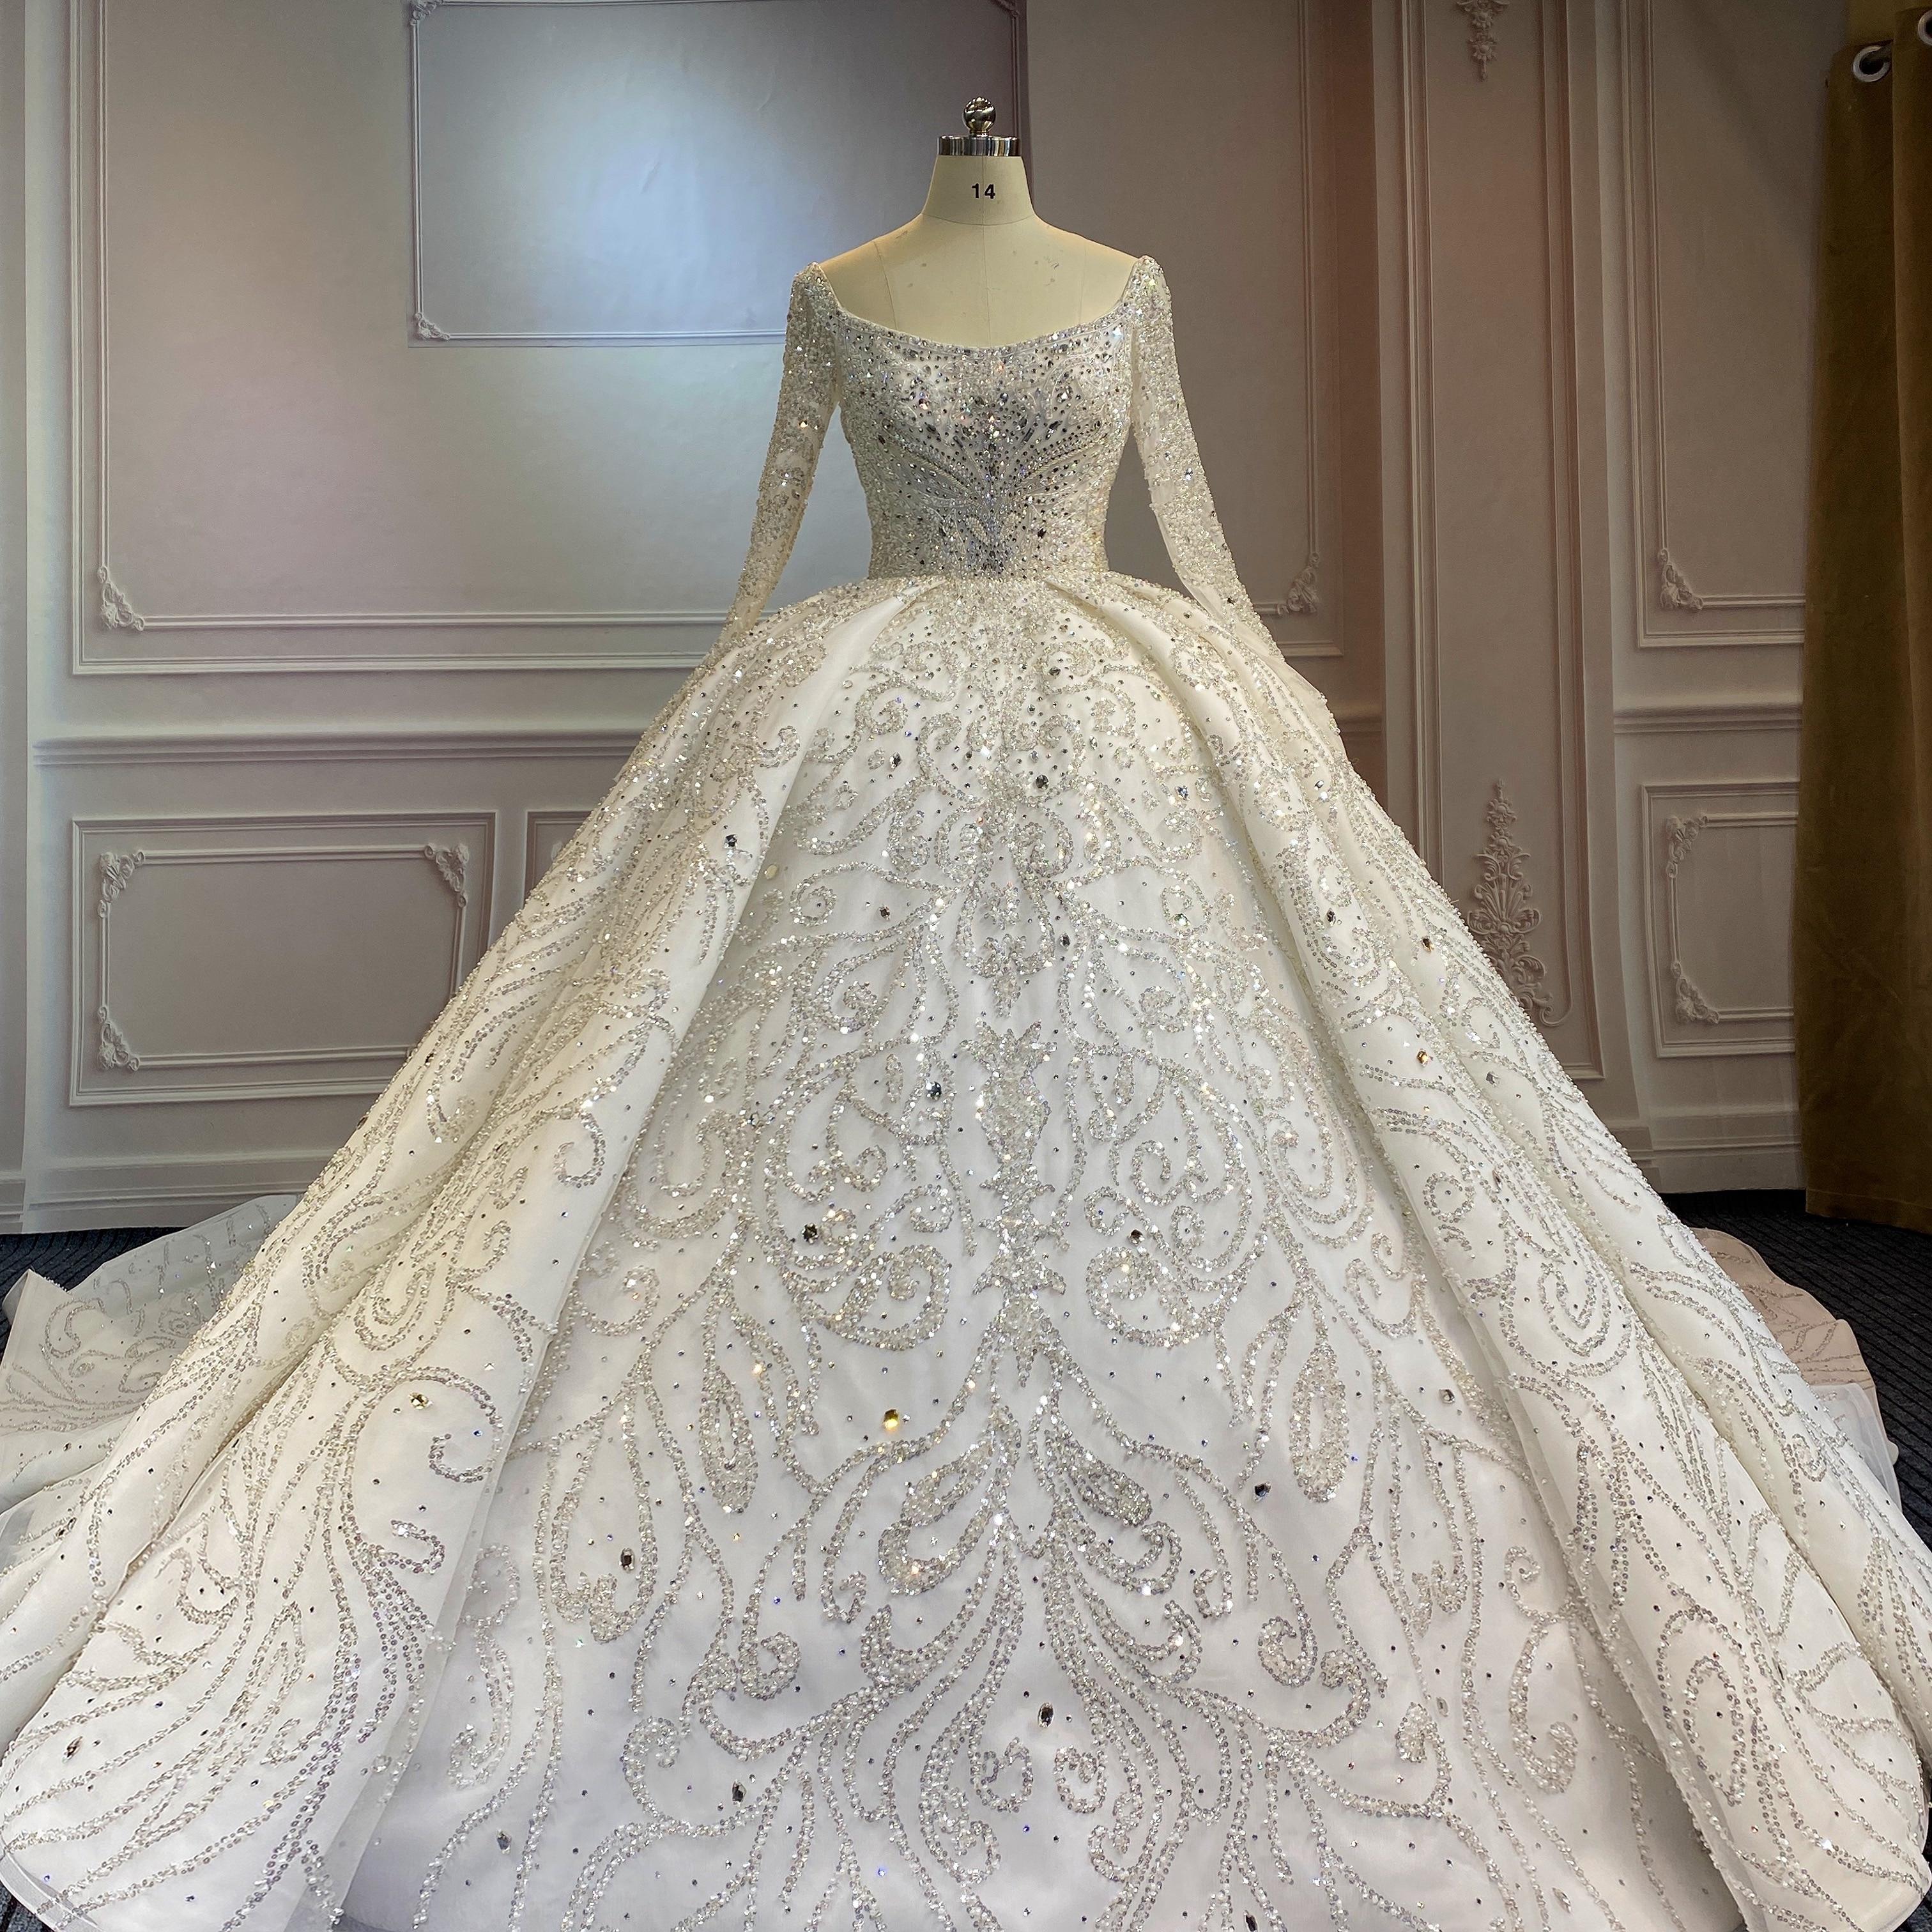 Marnham Luxury Wedding Dress Bridal Dresses Off the Shoulder Ball Gown Long Trail Full Sleeves